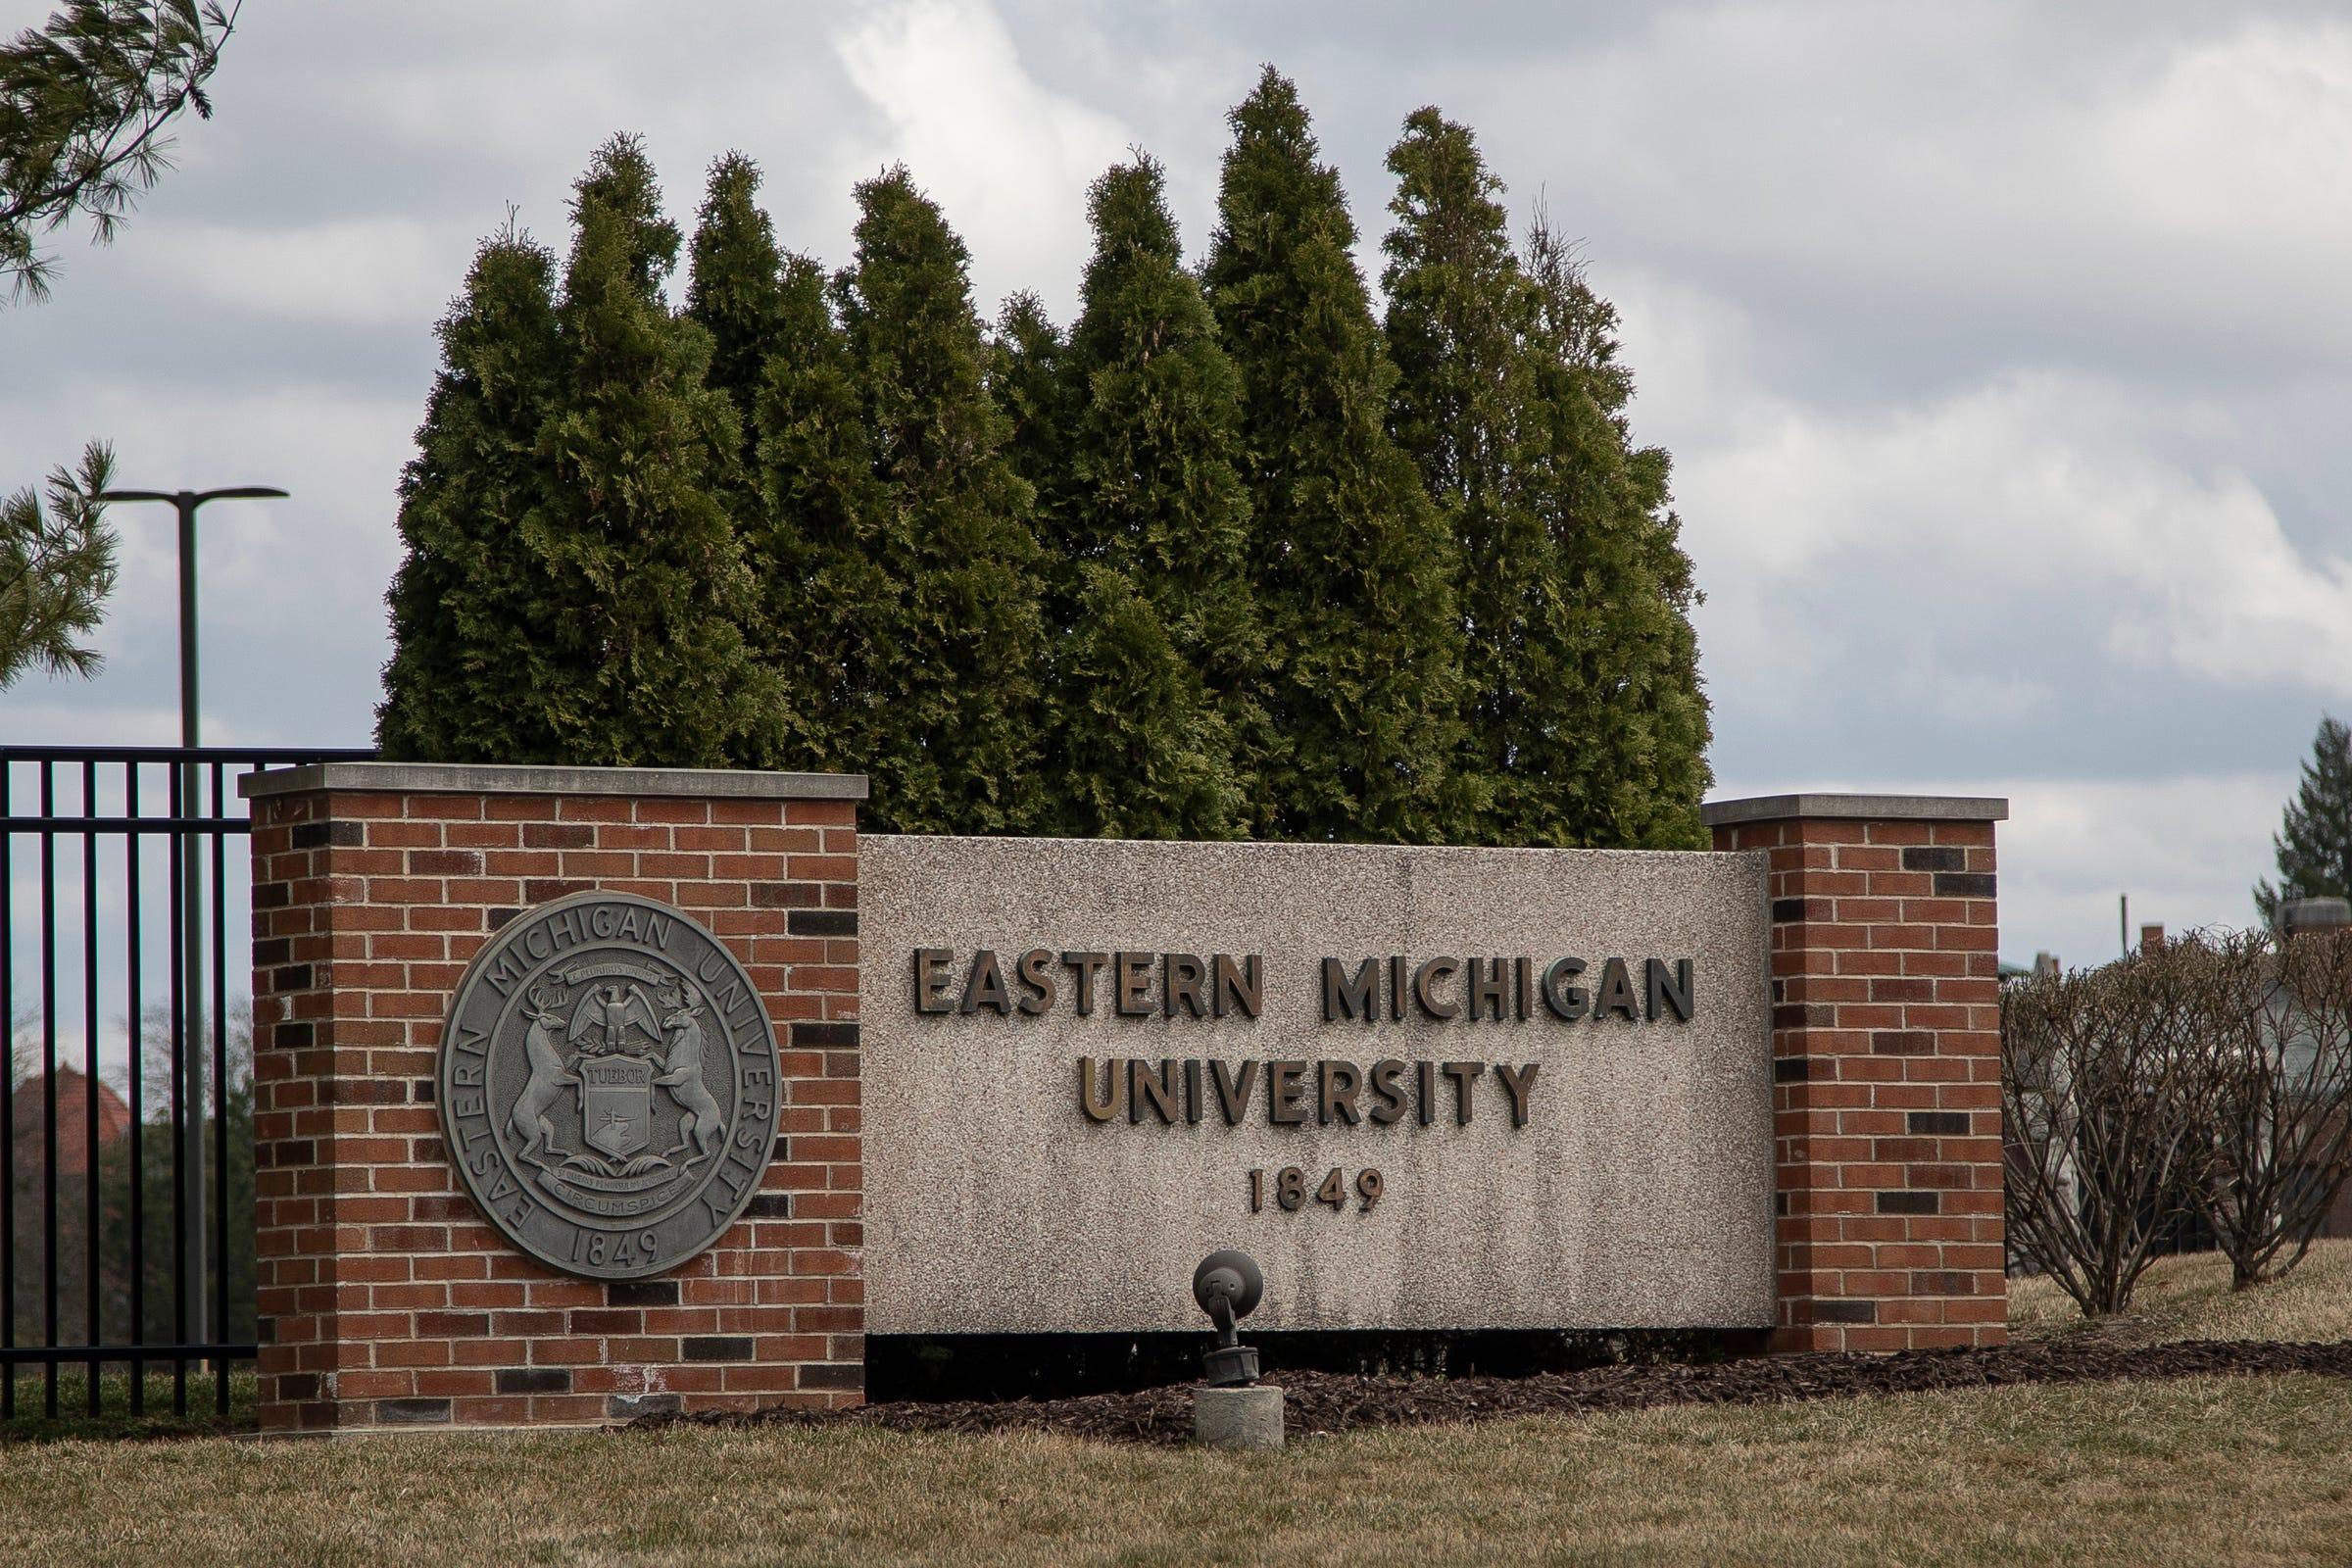 Eastern Michigan University campus in Ypsilanti, Wednesday, March 24, 2021.